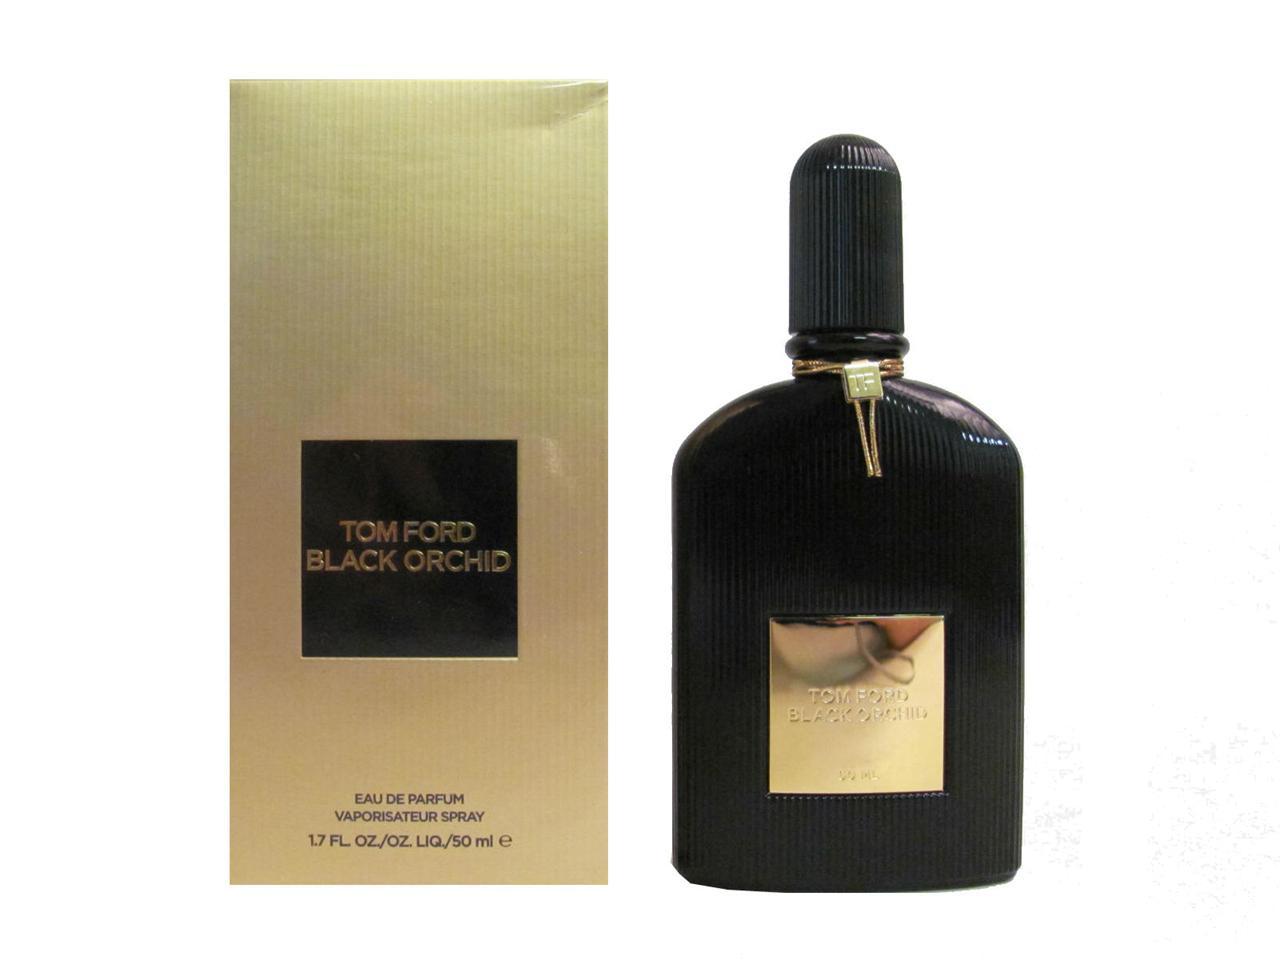 tom ford black orchid 1 7 oz eau de parfum spray for women. Black Bedroom Furniture Sets. Home Design Ideas